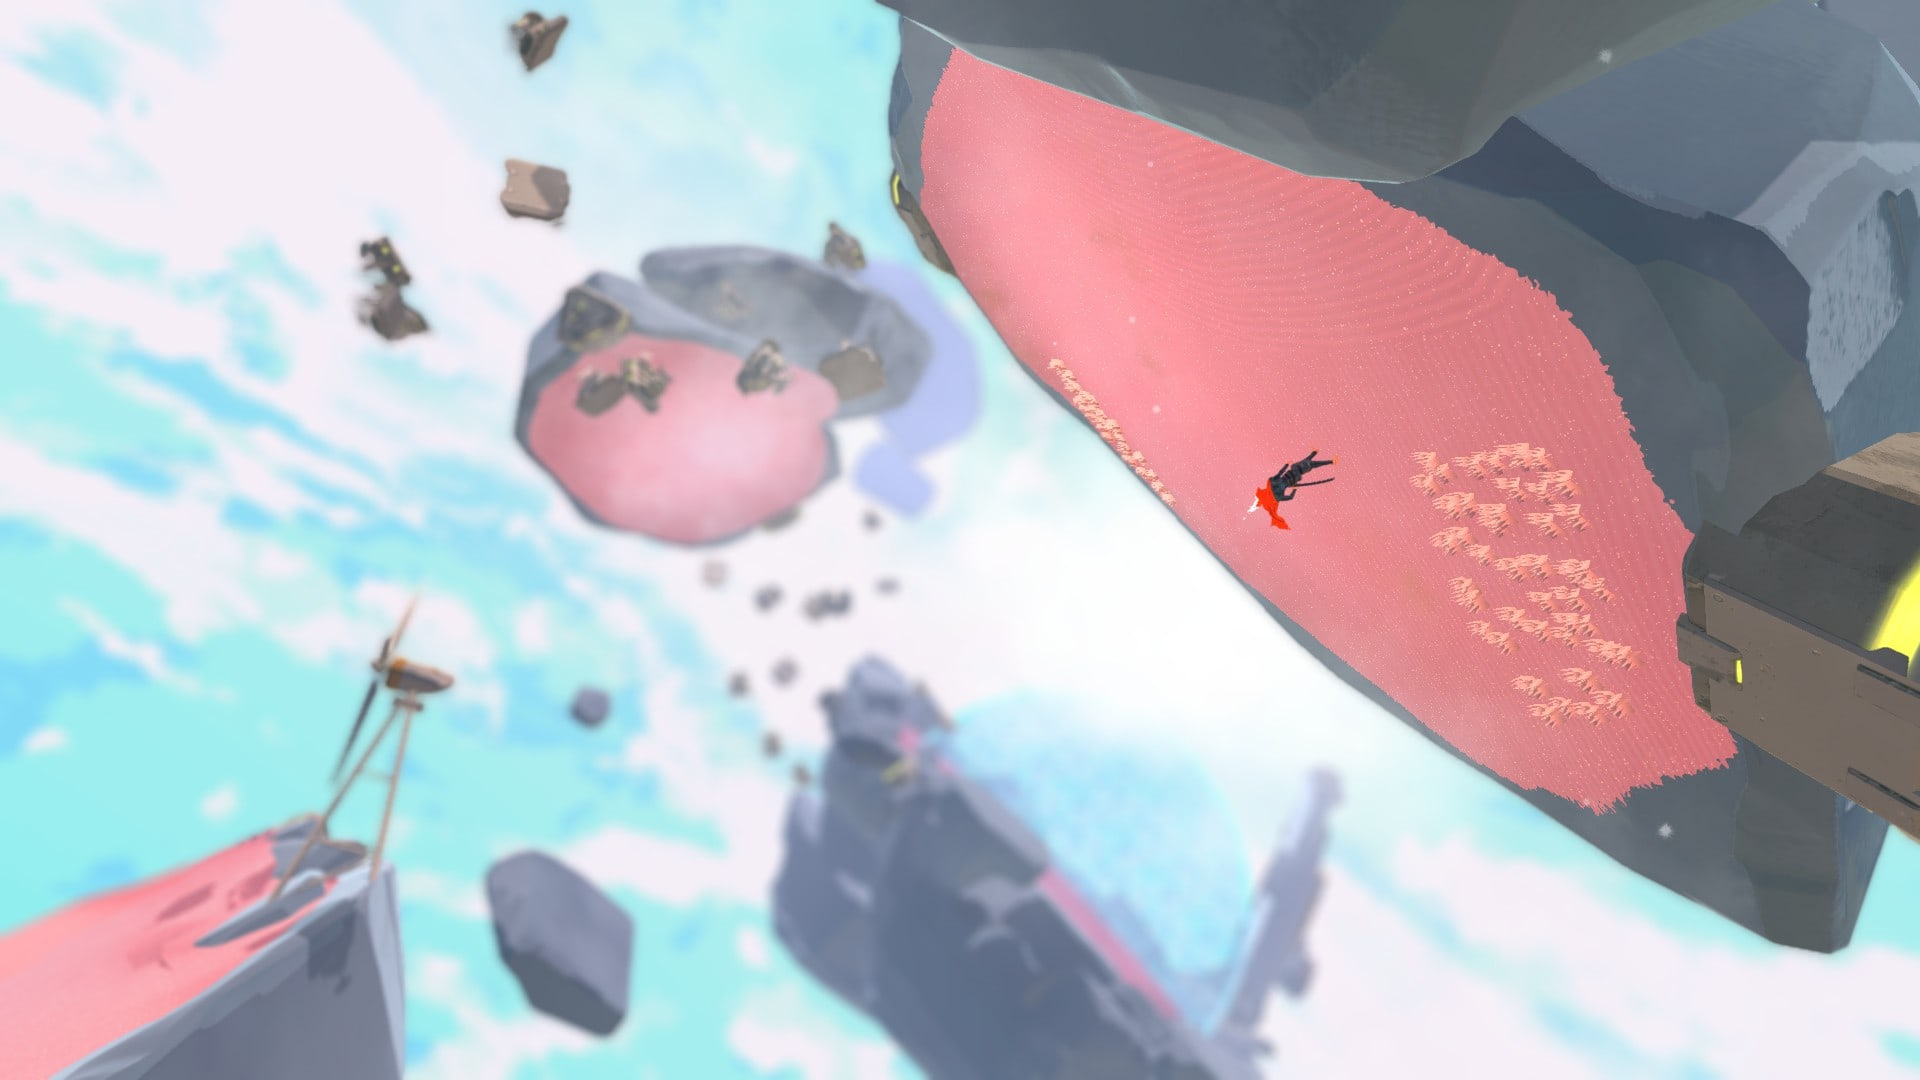 Furi: Video Game, Work of Art, or Both?